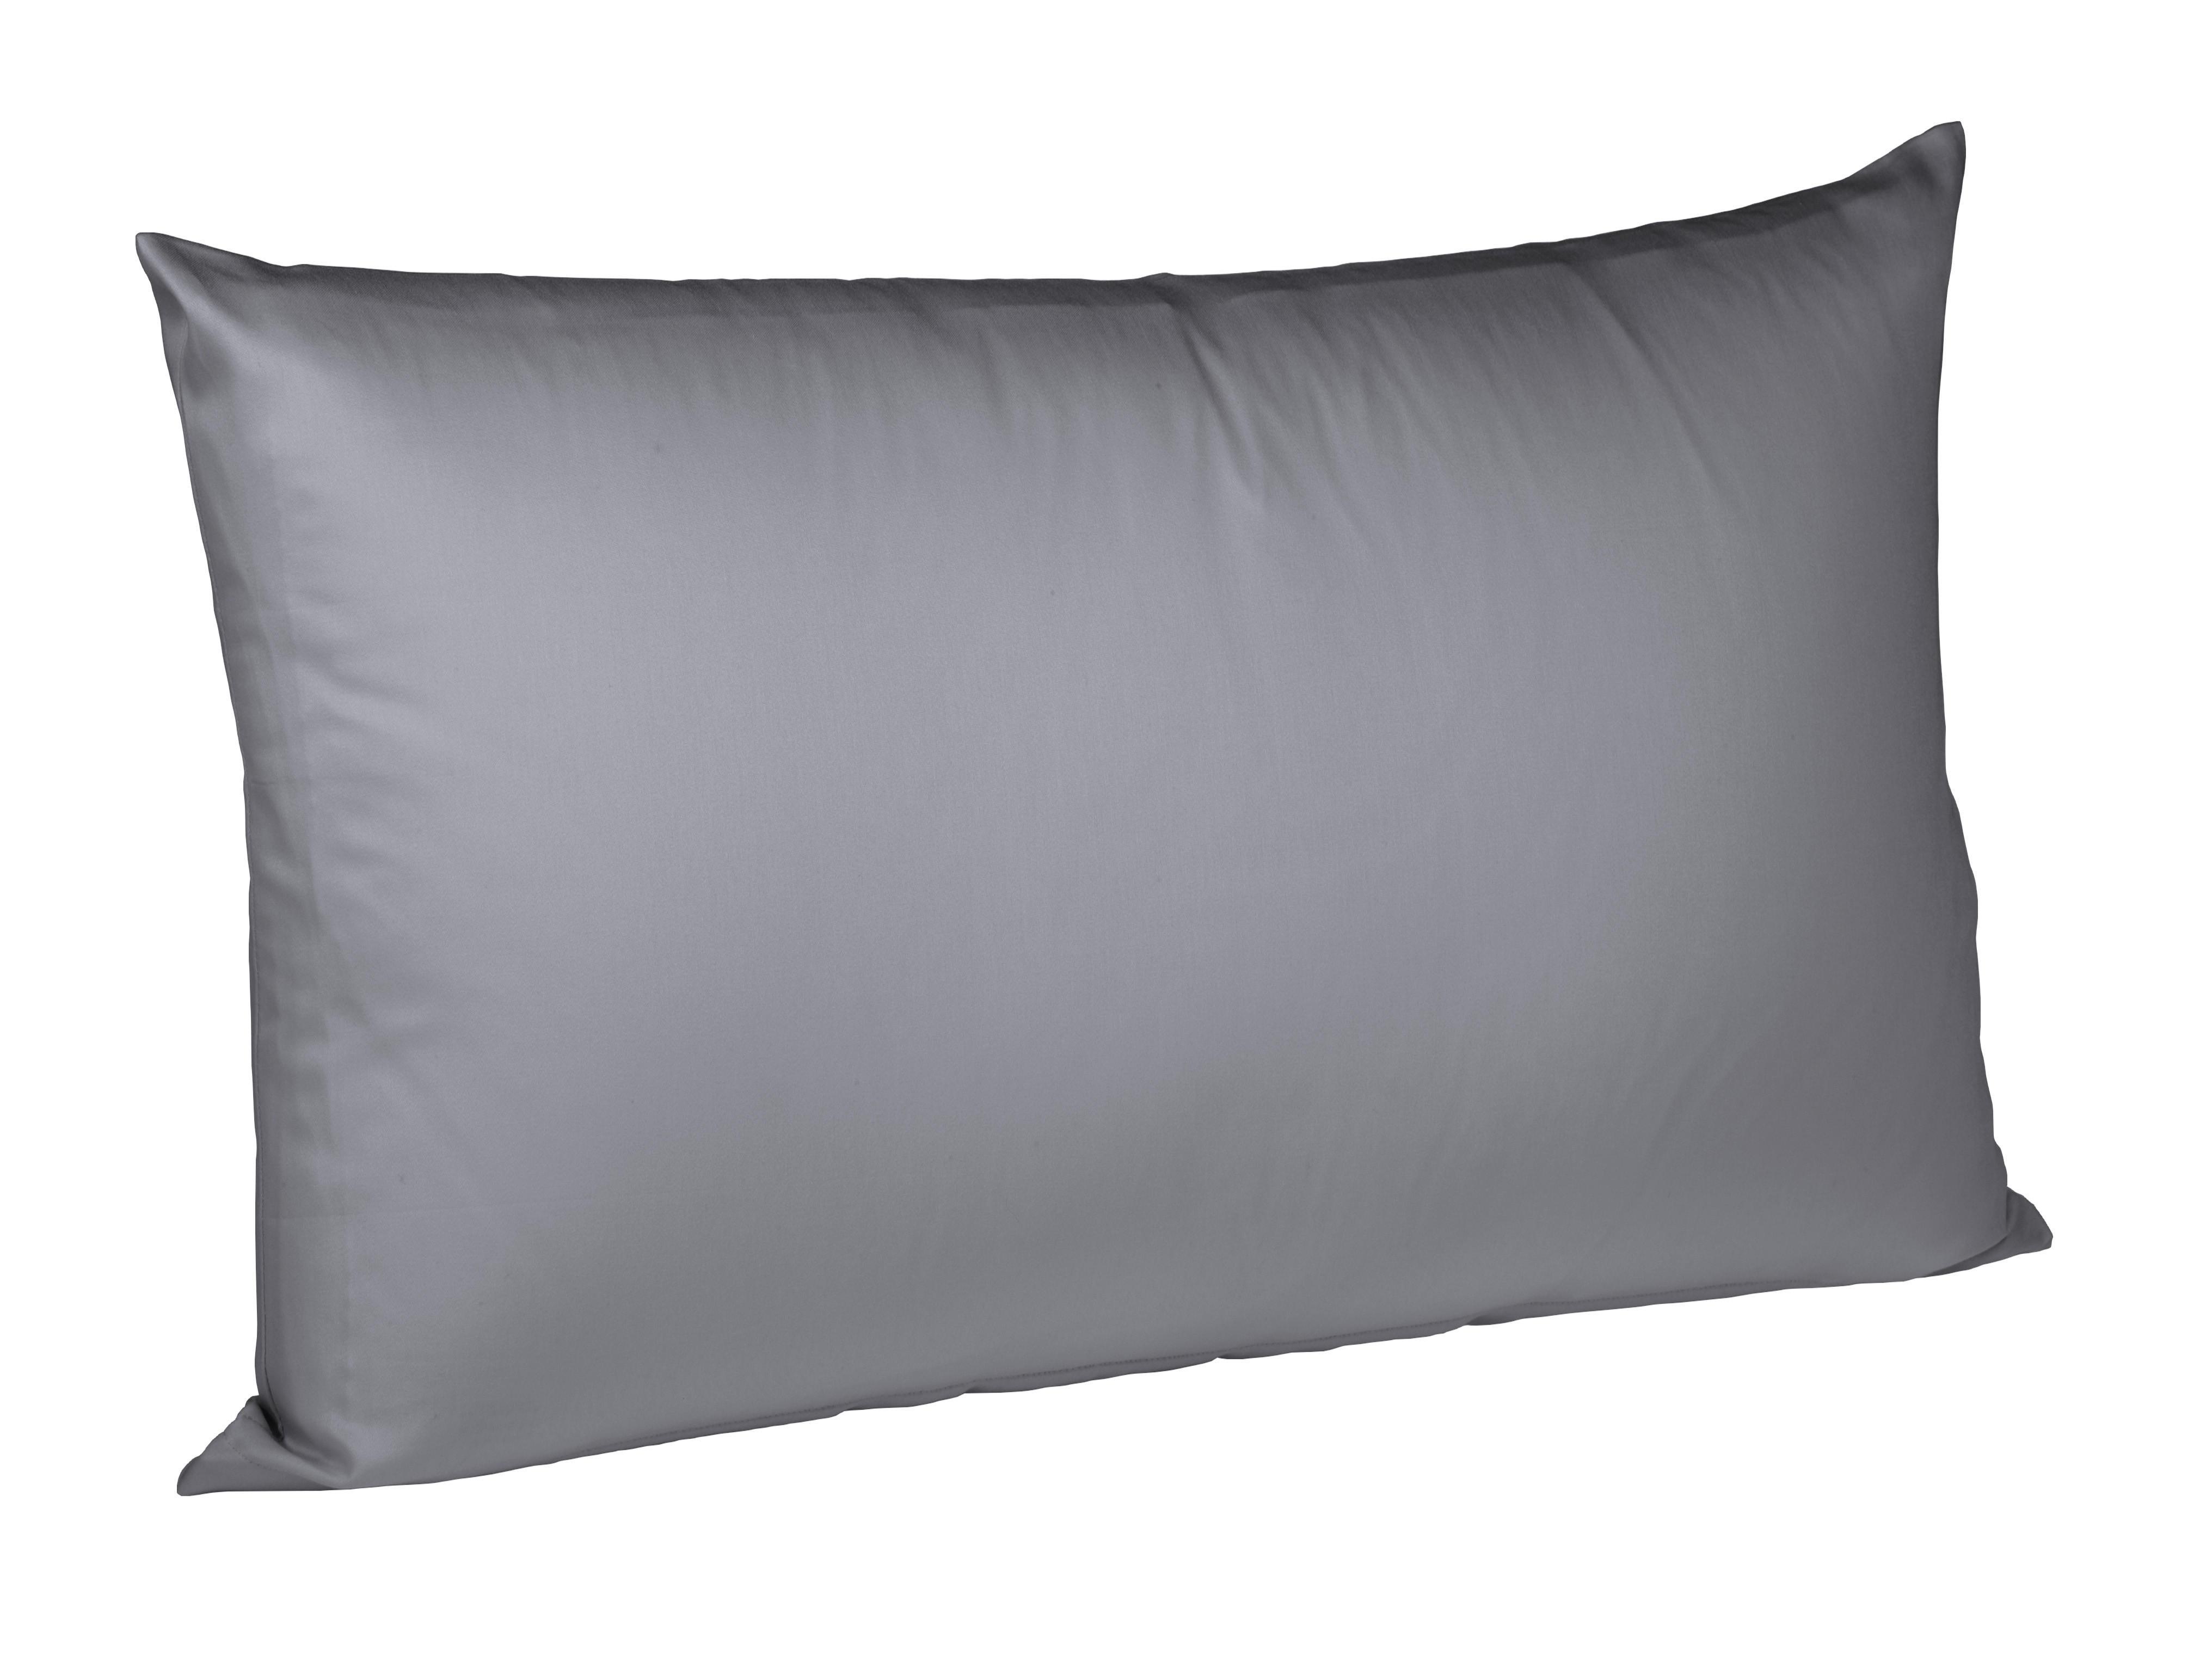 KISSENHÜLLE Graphitfarben 40/80 cm - Graphitfarben, Basics, Textil (40/80cm) - FLEURESSE